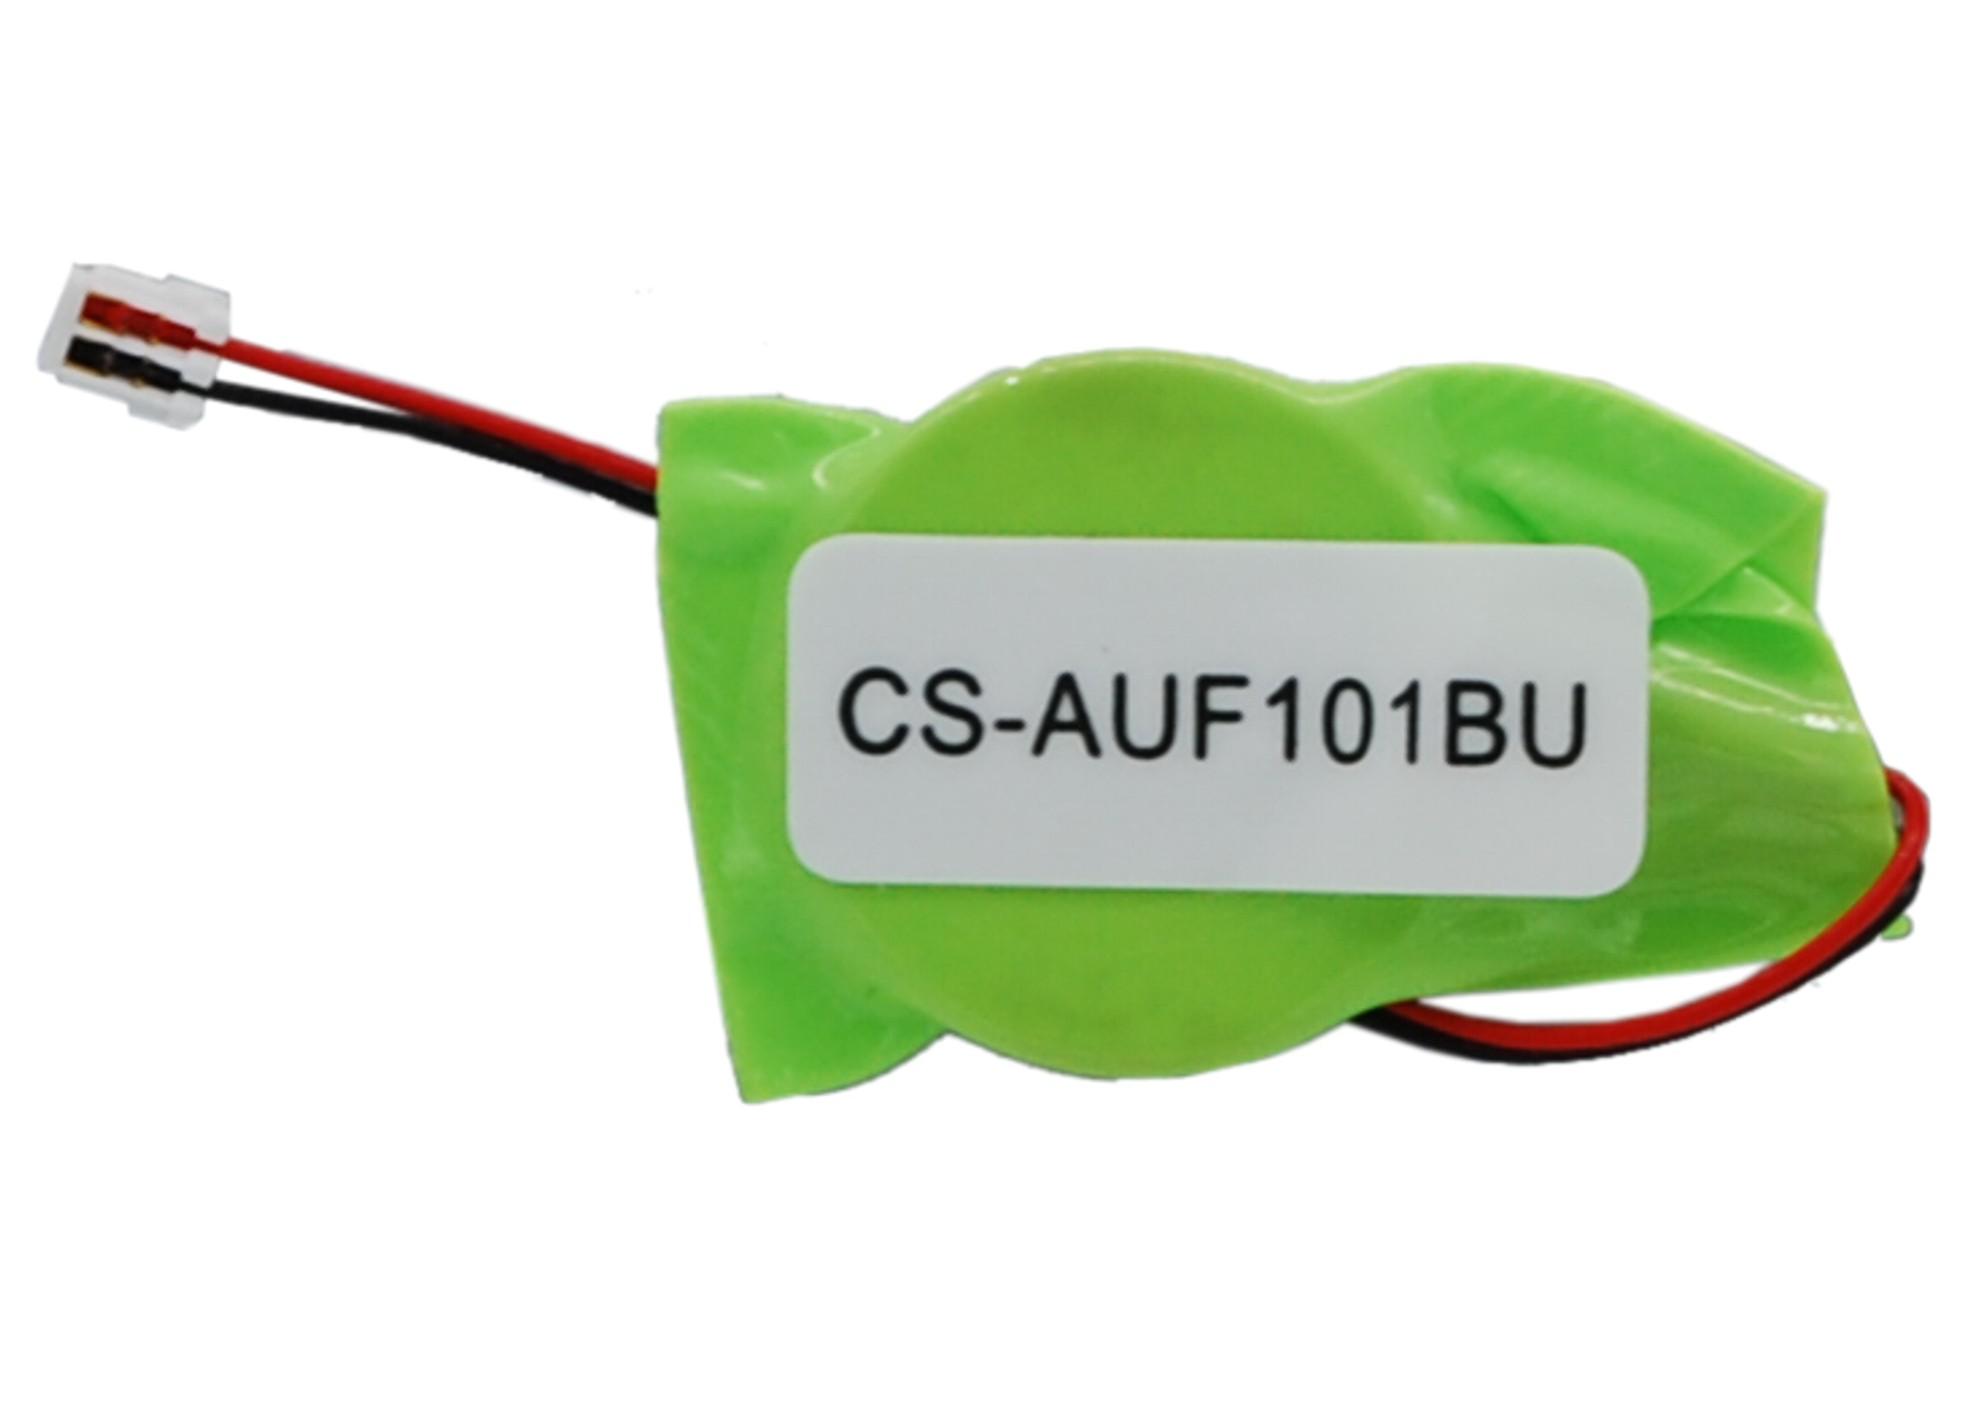 Cameron Sino baterie cmos pro ASUS Eee Pad Transformer TF101-1B141A 3V Li-ion 40mAh zelená - neoriginální